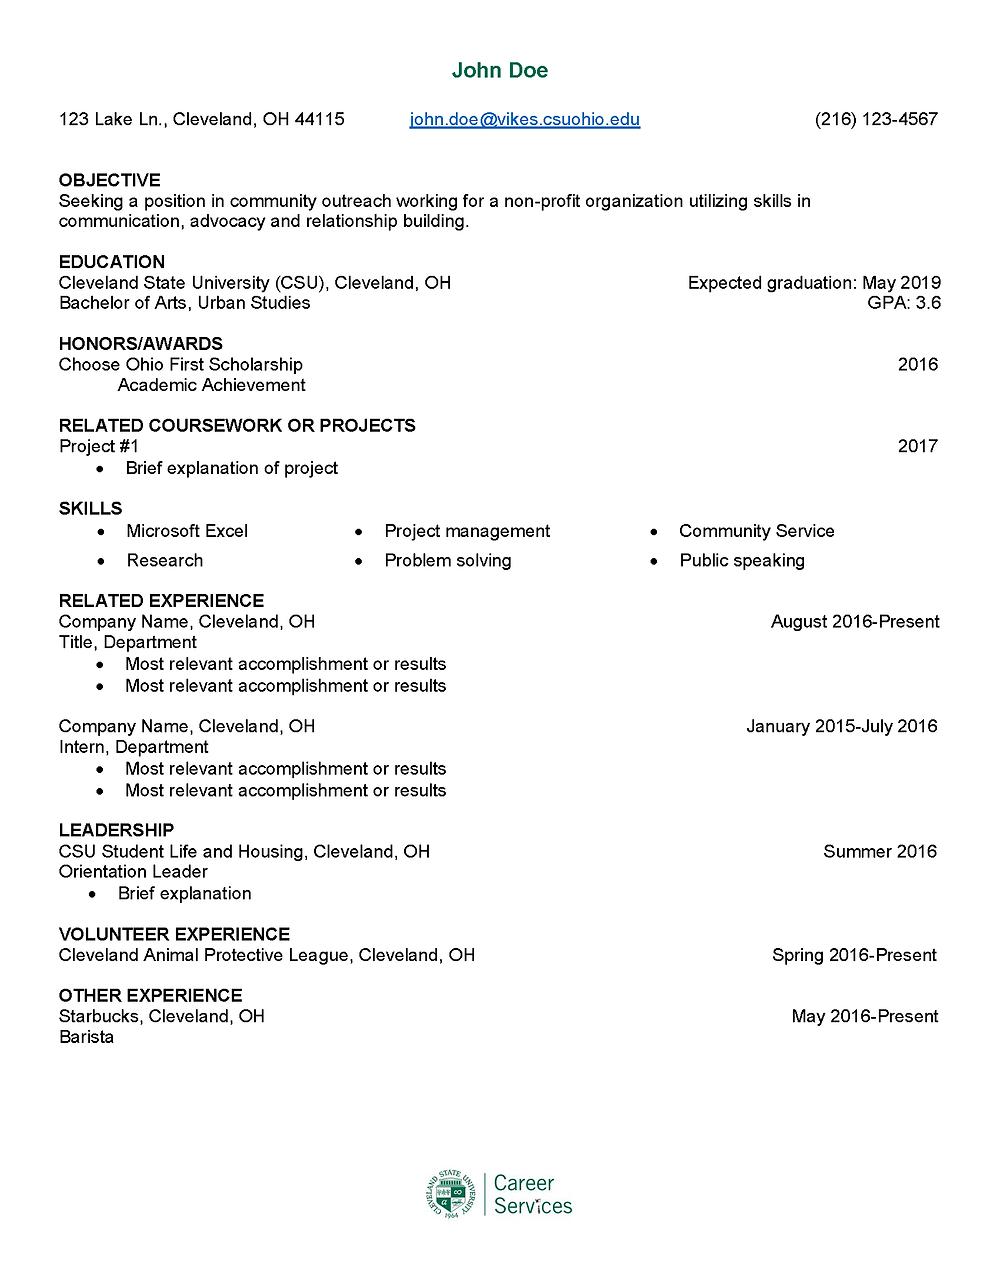 John Doe Resume template page one.